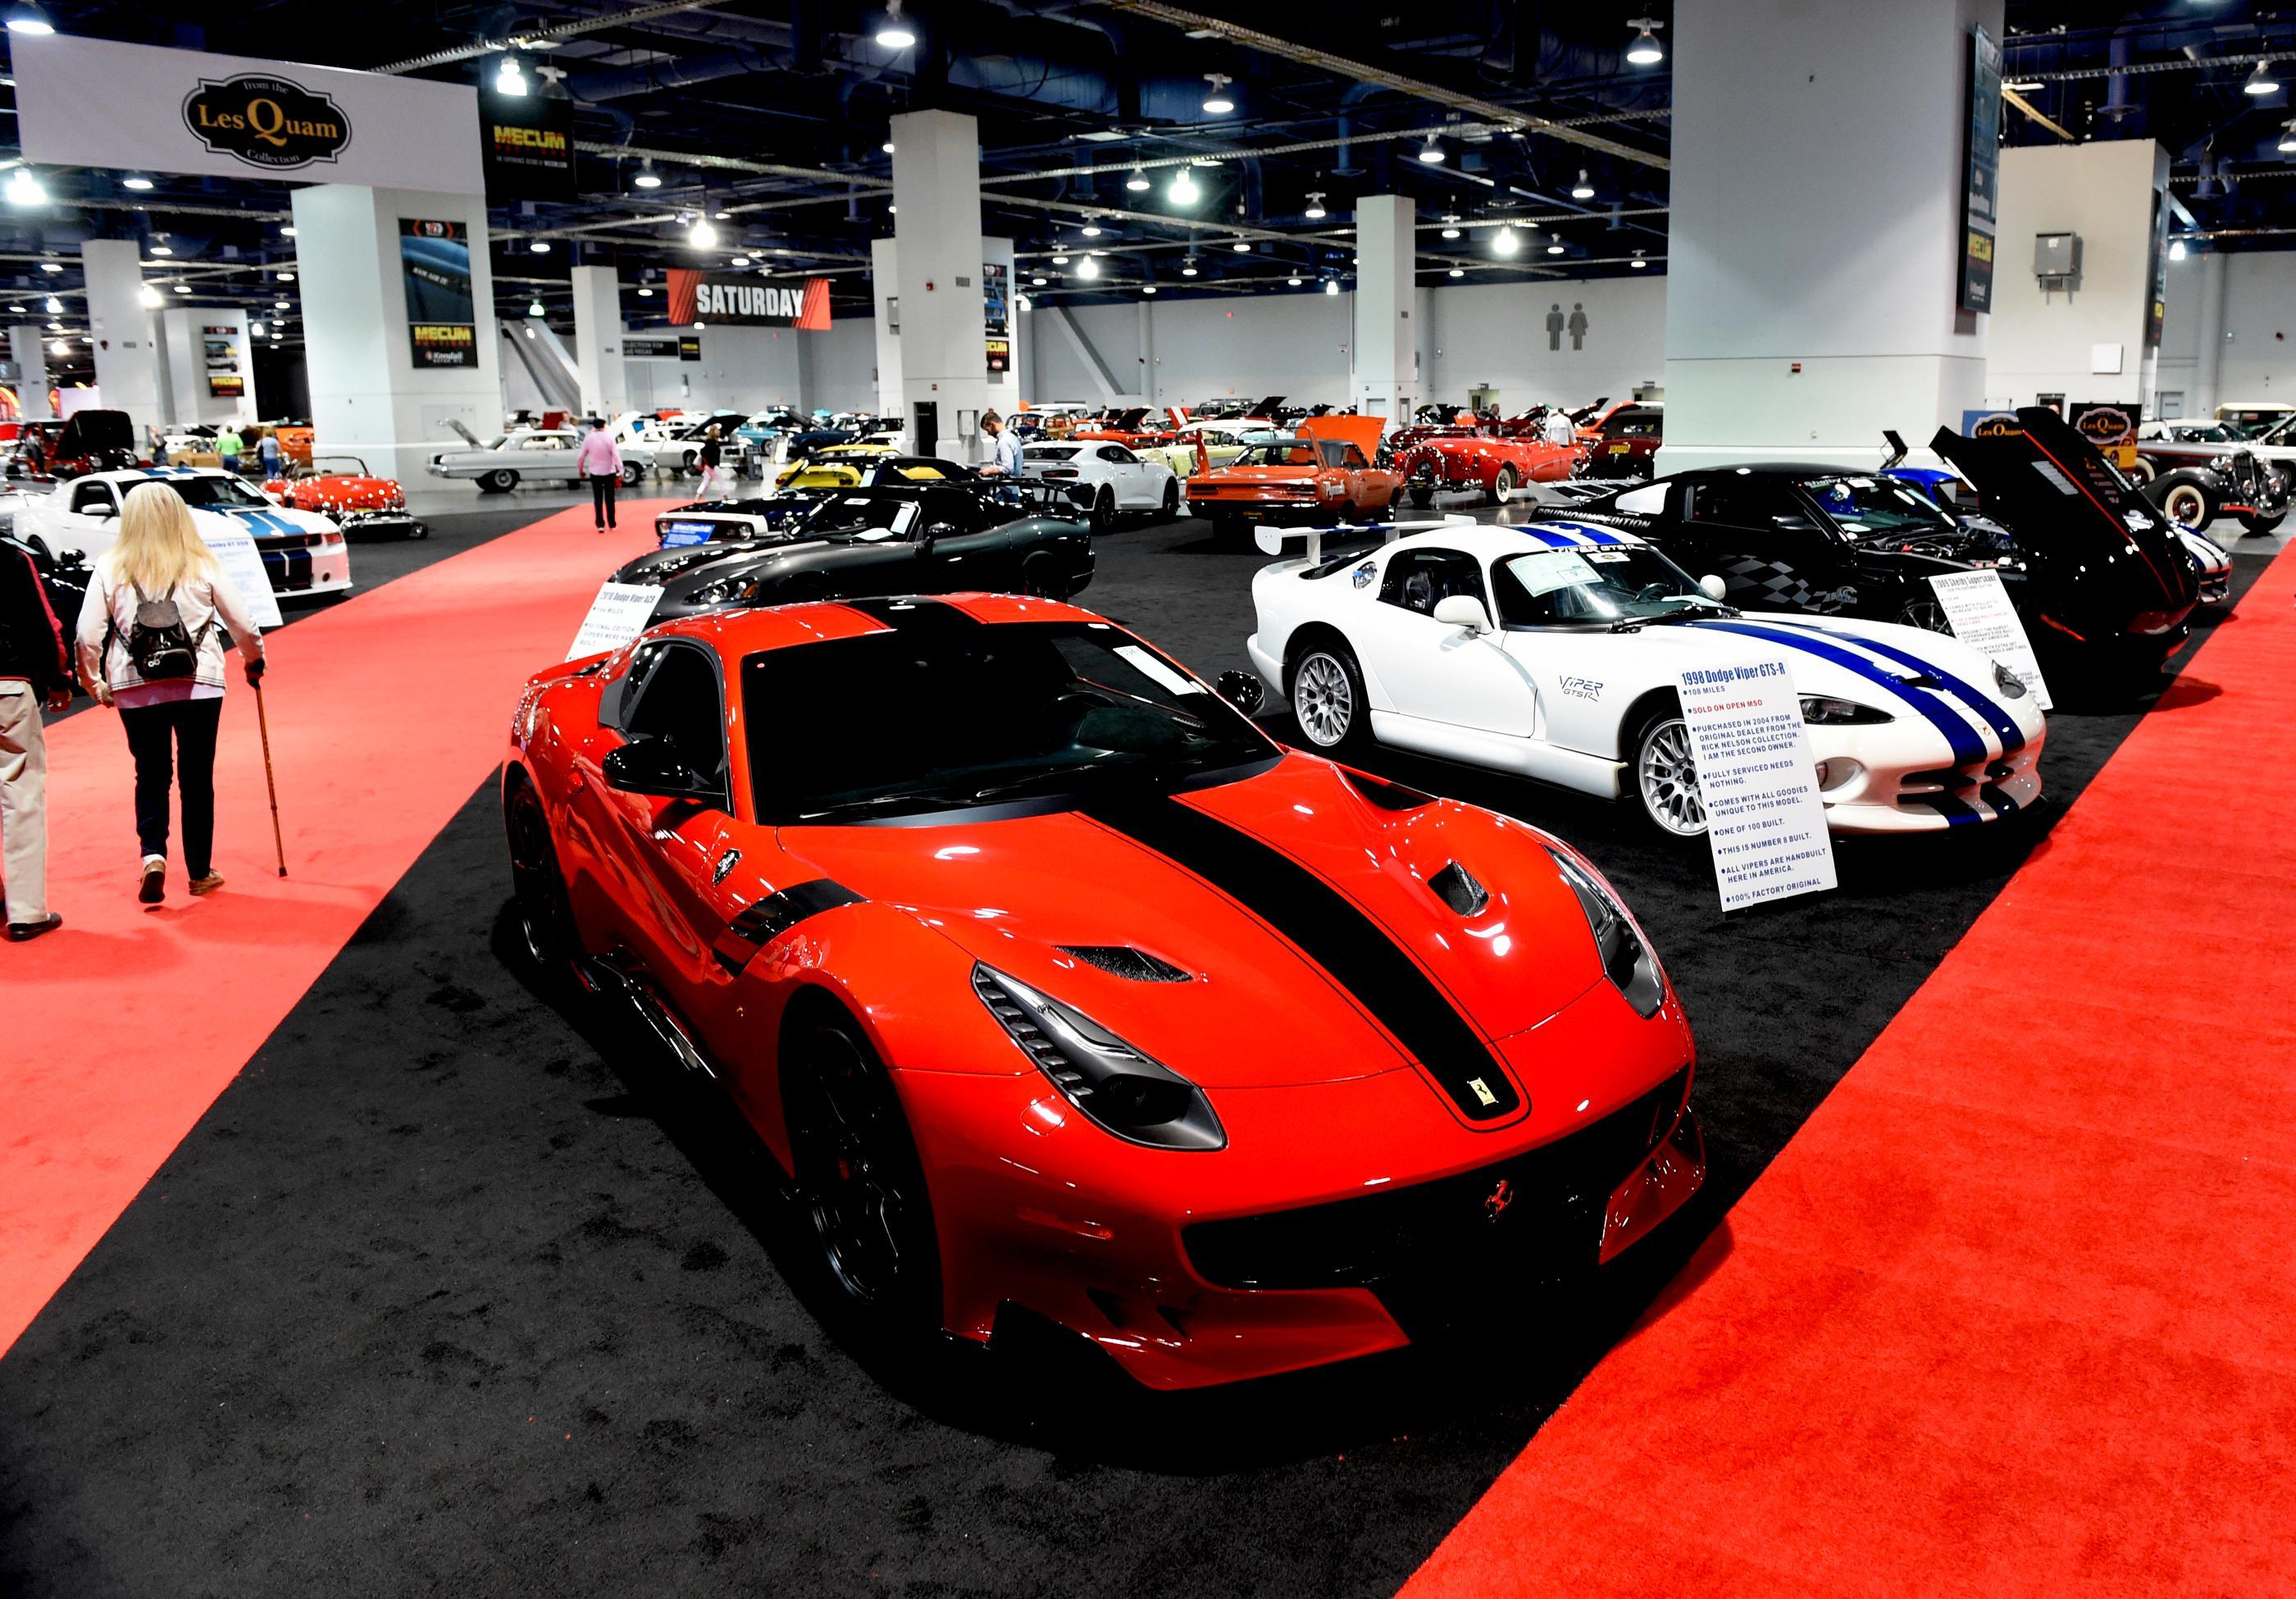 GALLERY | Mecum Car Auction at the Las Vegas Convention Center | KSNV